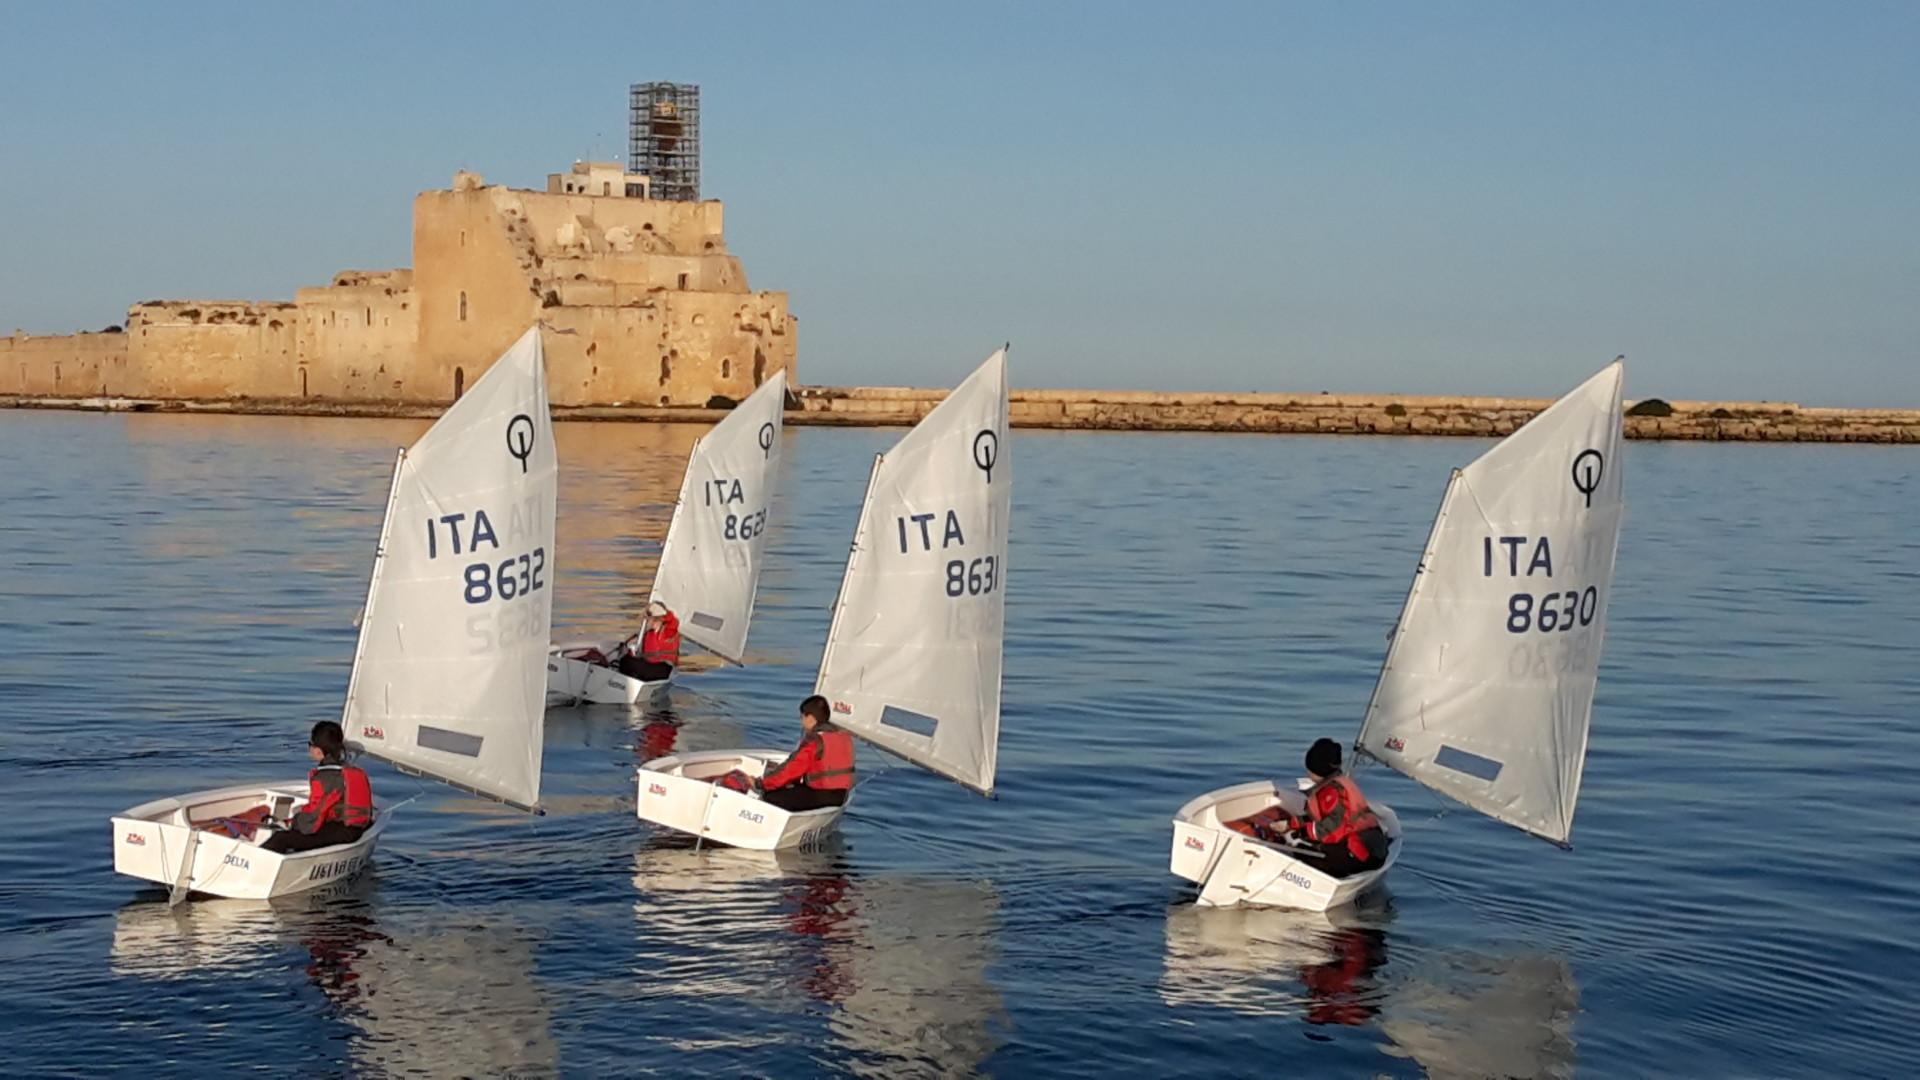 Scuola-di-vela-lega-navale-LNI-Brindisi (4)